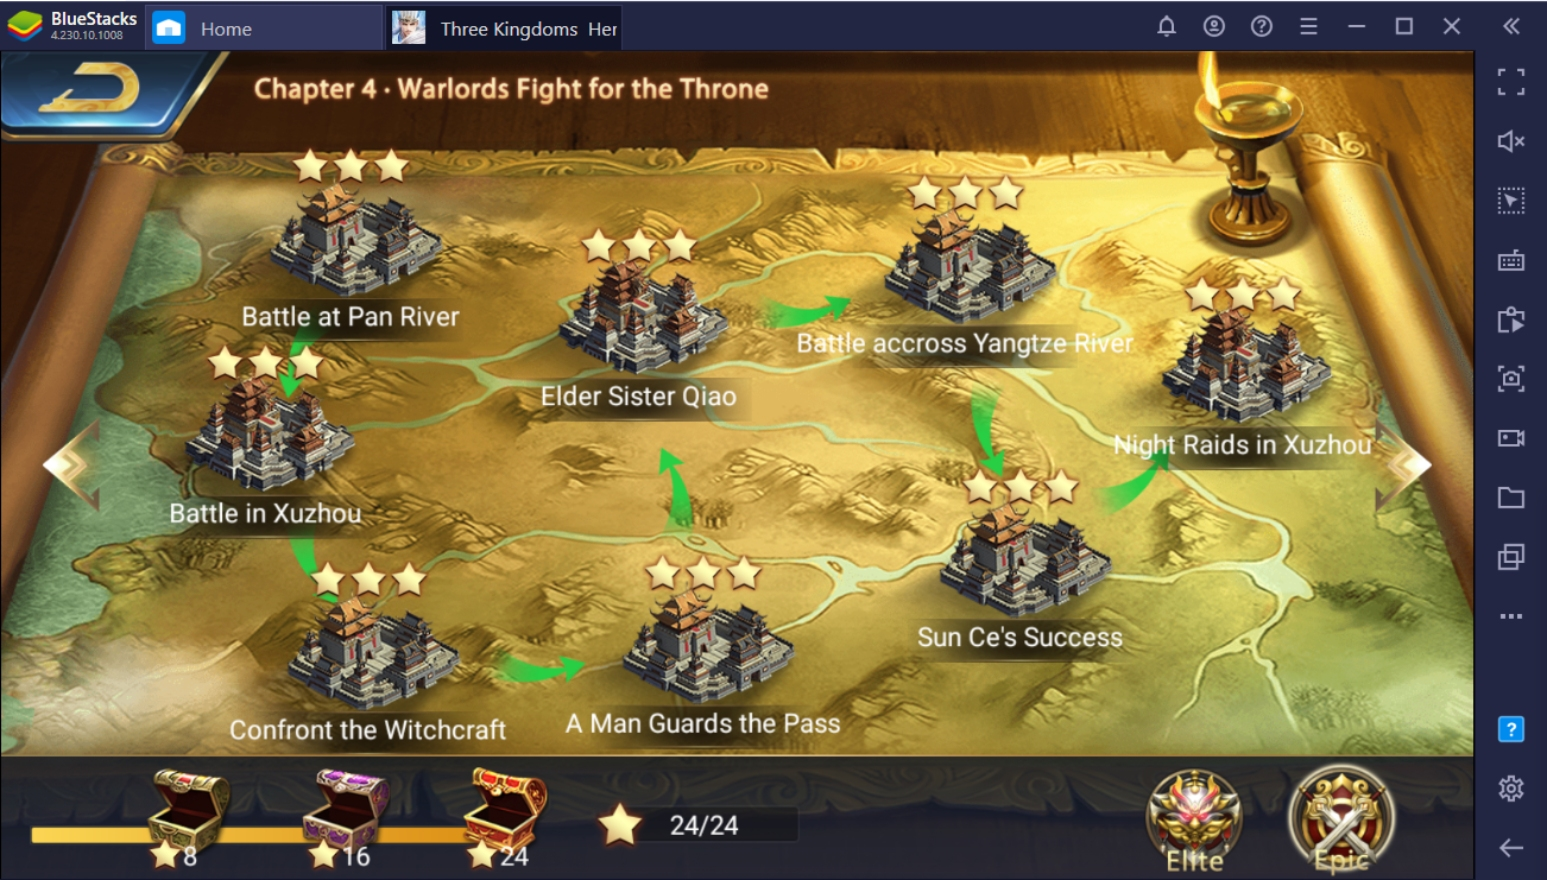 Three Kingdoms: Heroes Saga on PC – Hero Guide